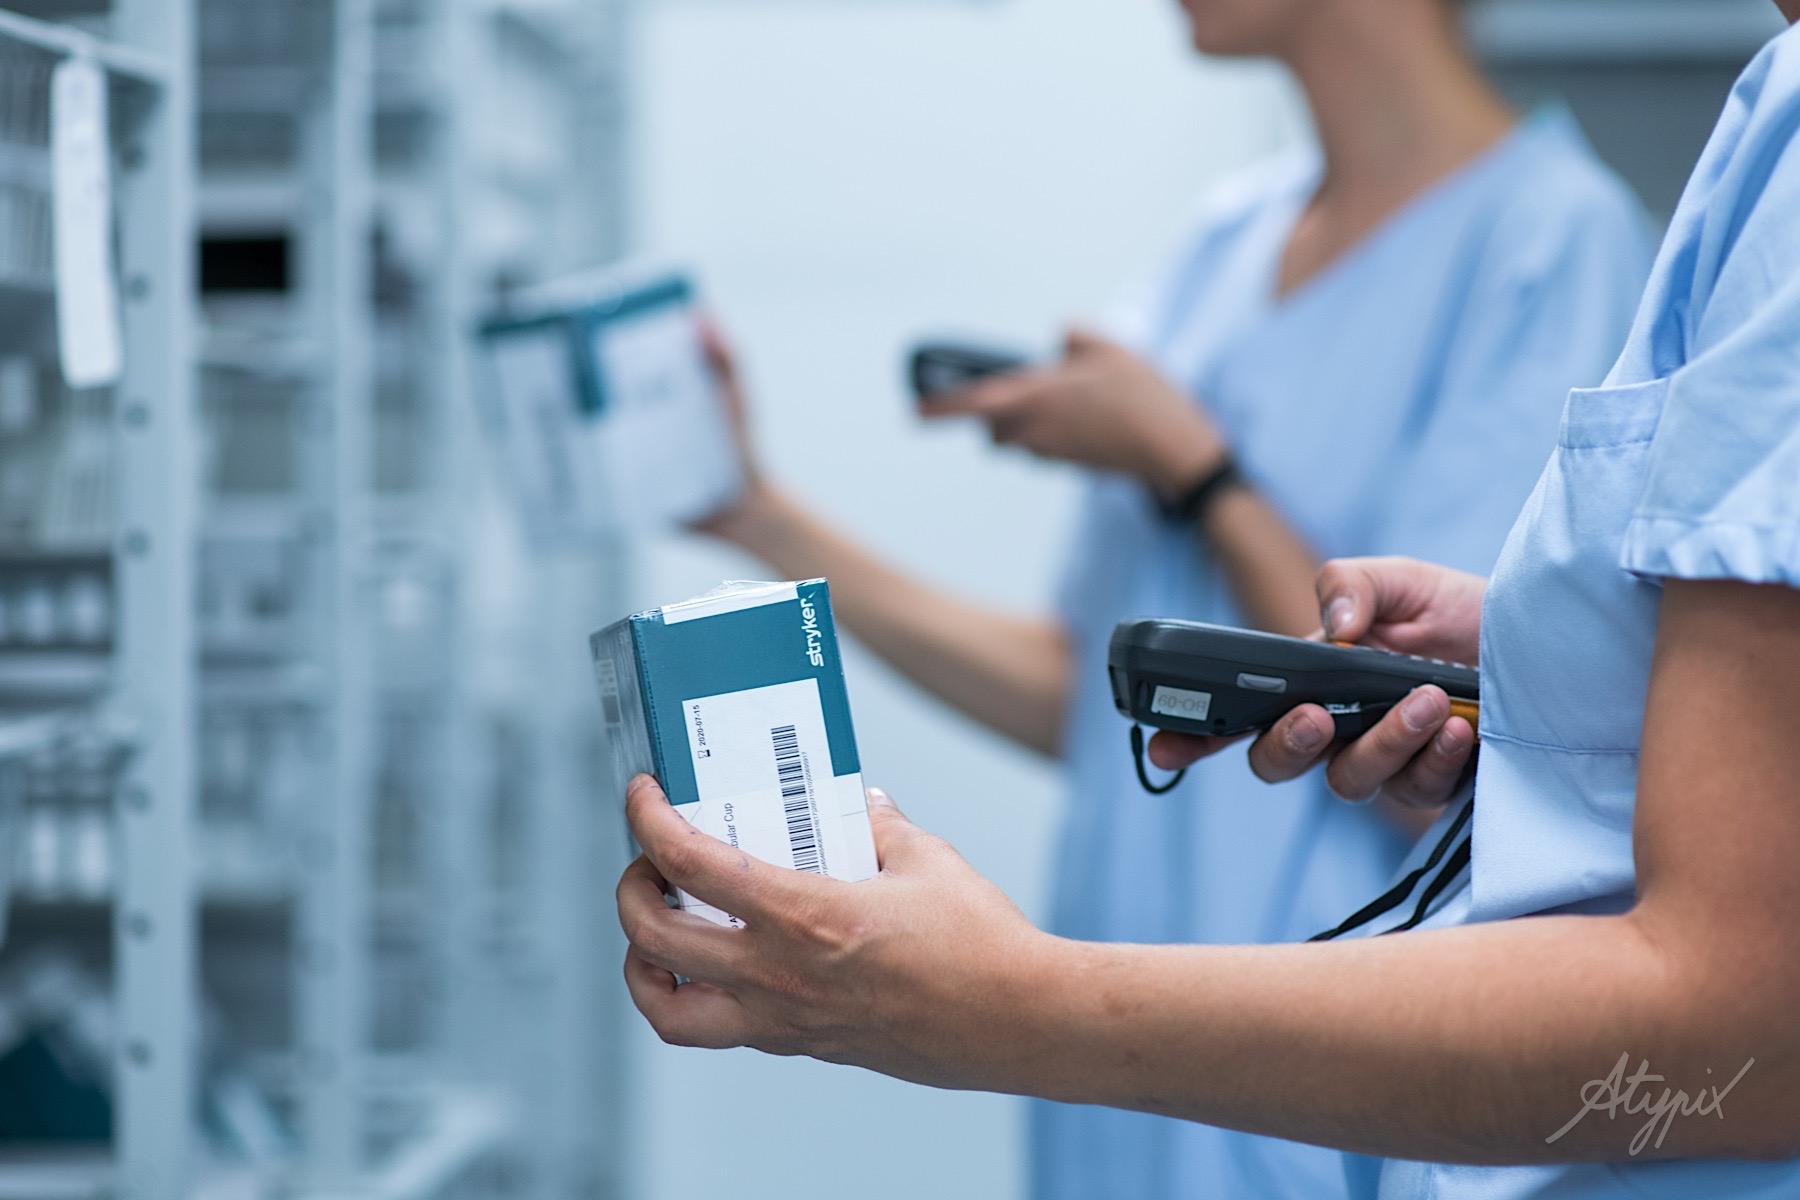 atypix photographie santé pharmacie